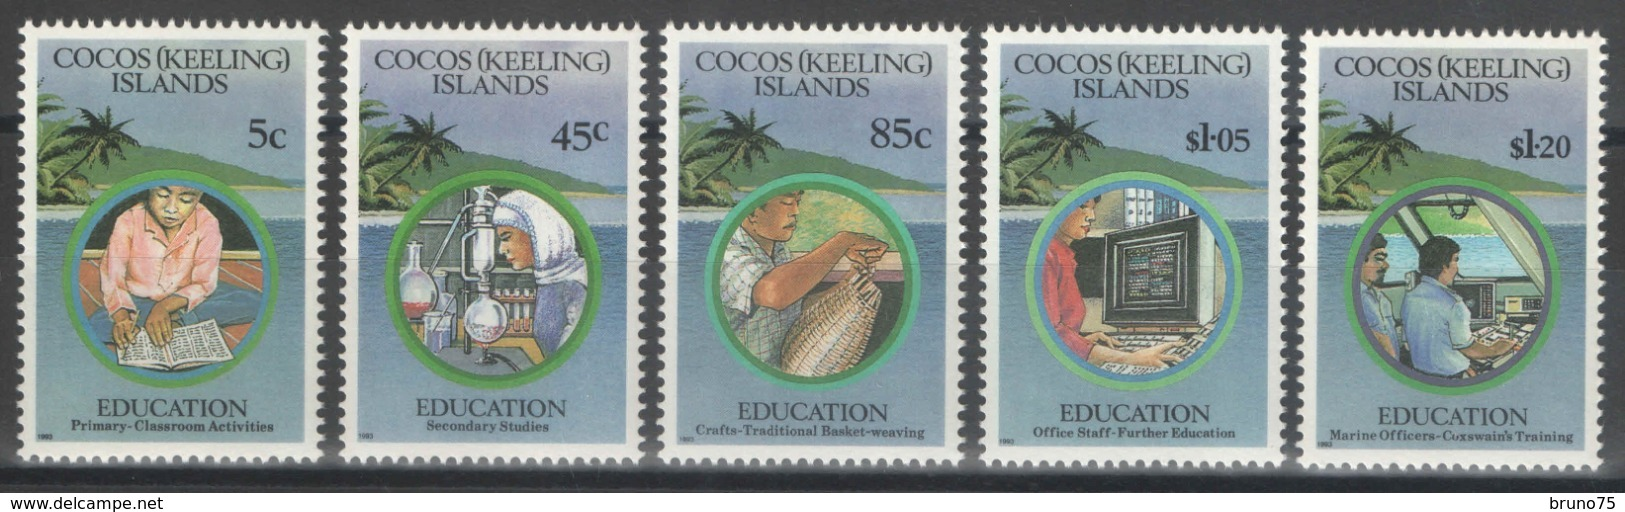 Cocos (Keeling) Islands - YT 275-279 ** MNH - 1993 - Education - Cocos (Keeling) Islands